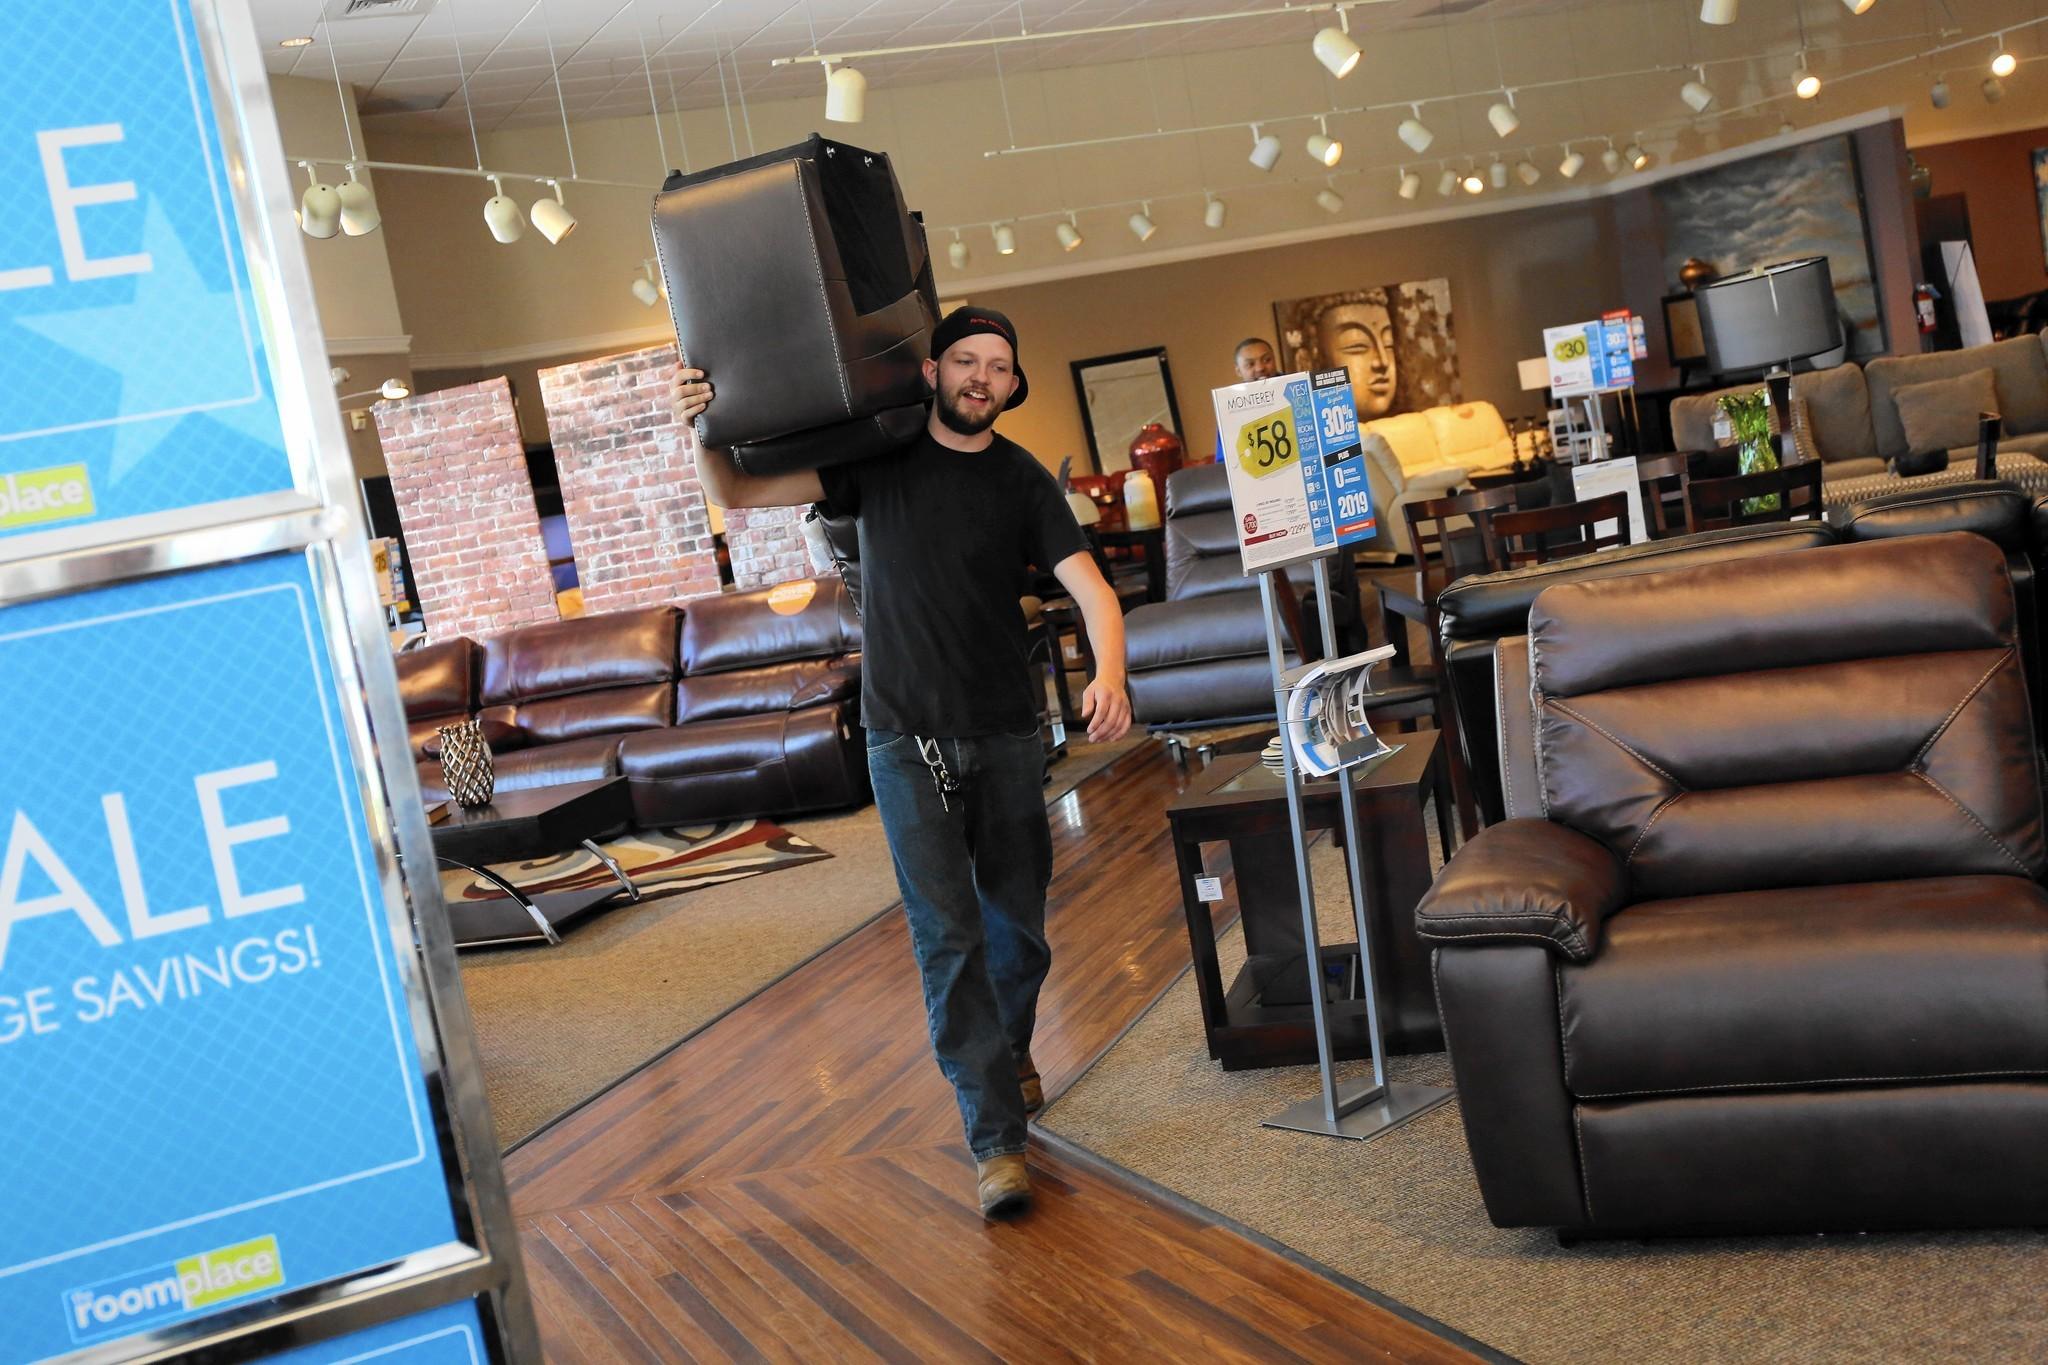 RoomPlace Rebuilding After Blaze Destroys Distribution Center   Chicago  Tribune